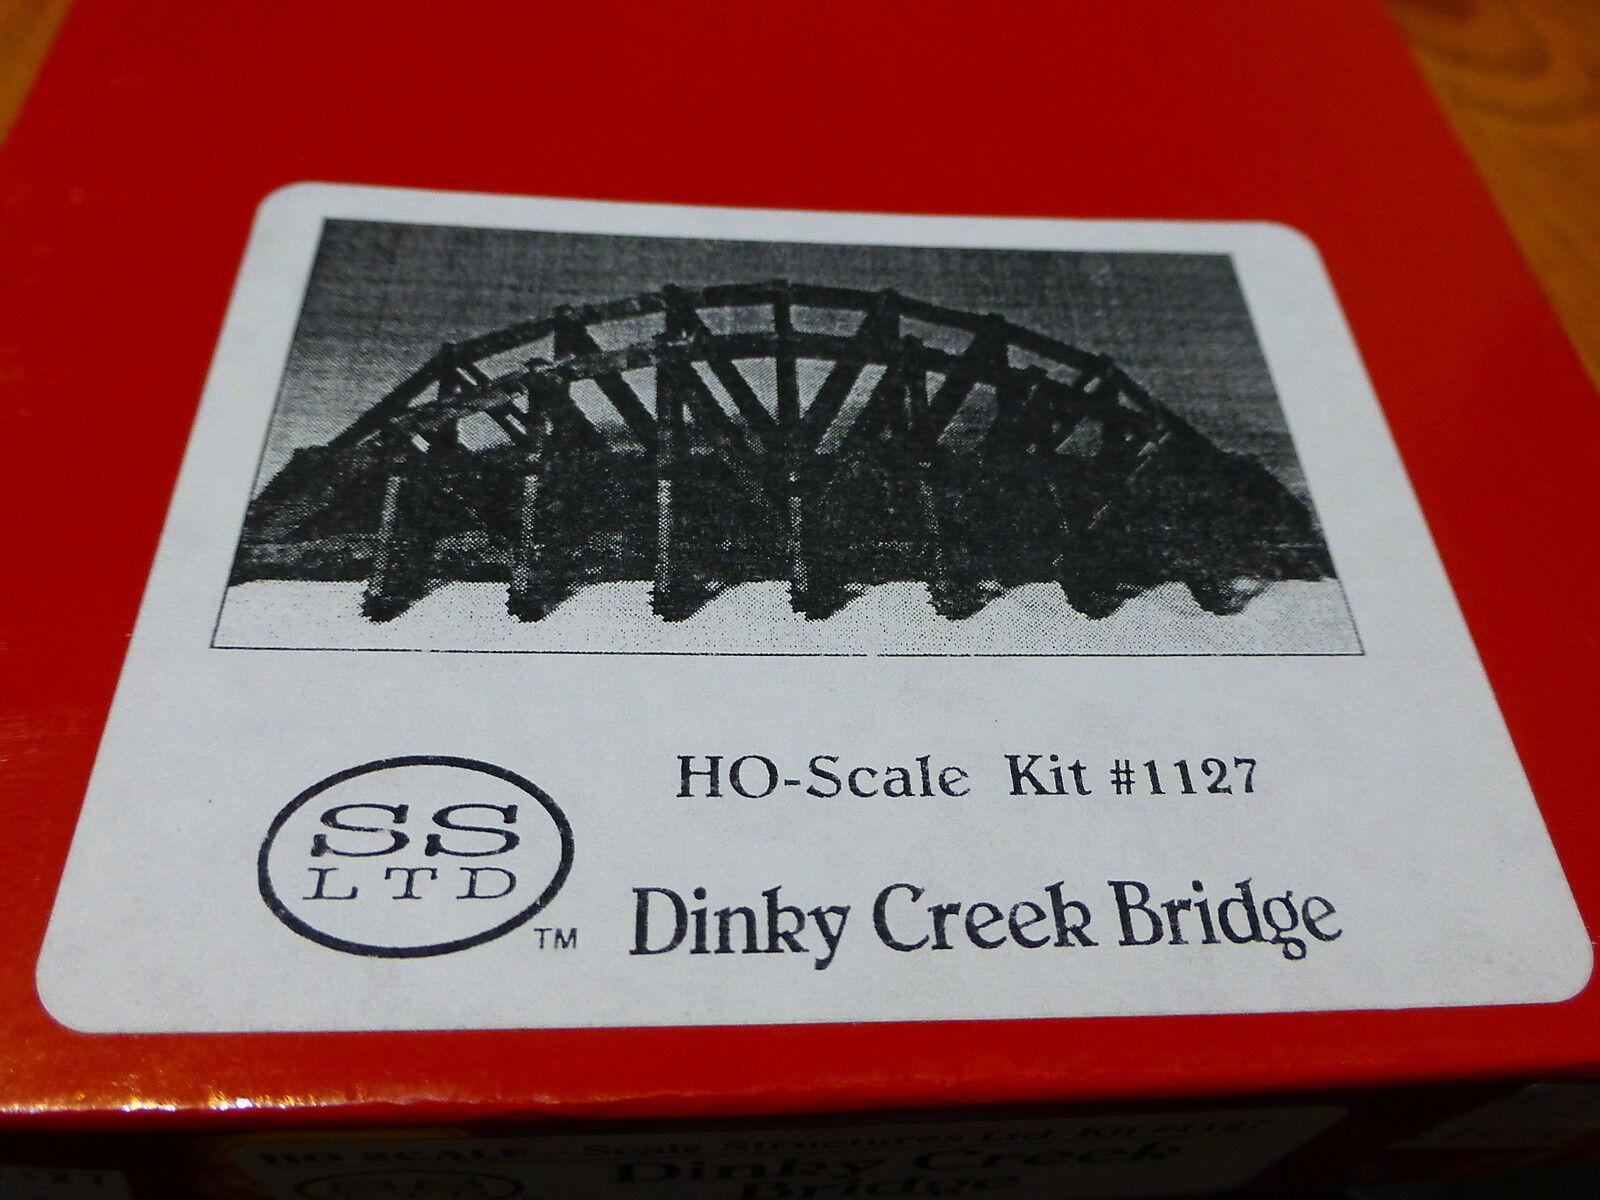 Scale Structures Ltd.  1127 Dinky Creek Bridge  Kit form  Craftsman  Wood & Cast